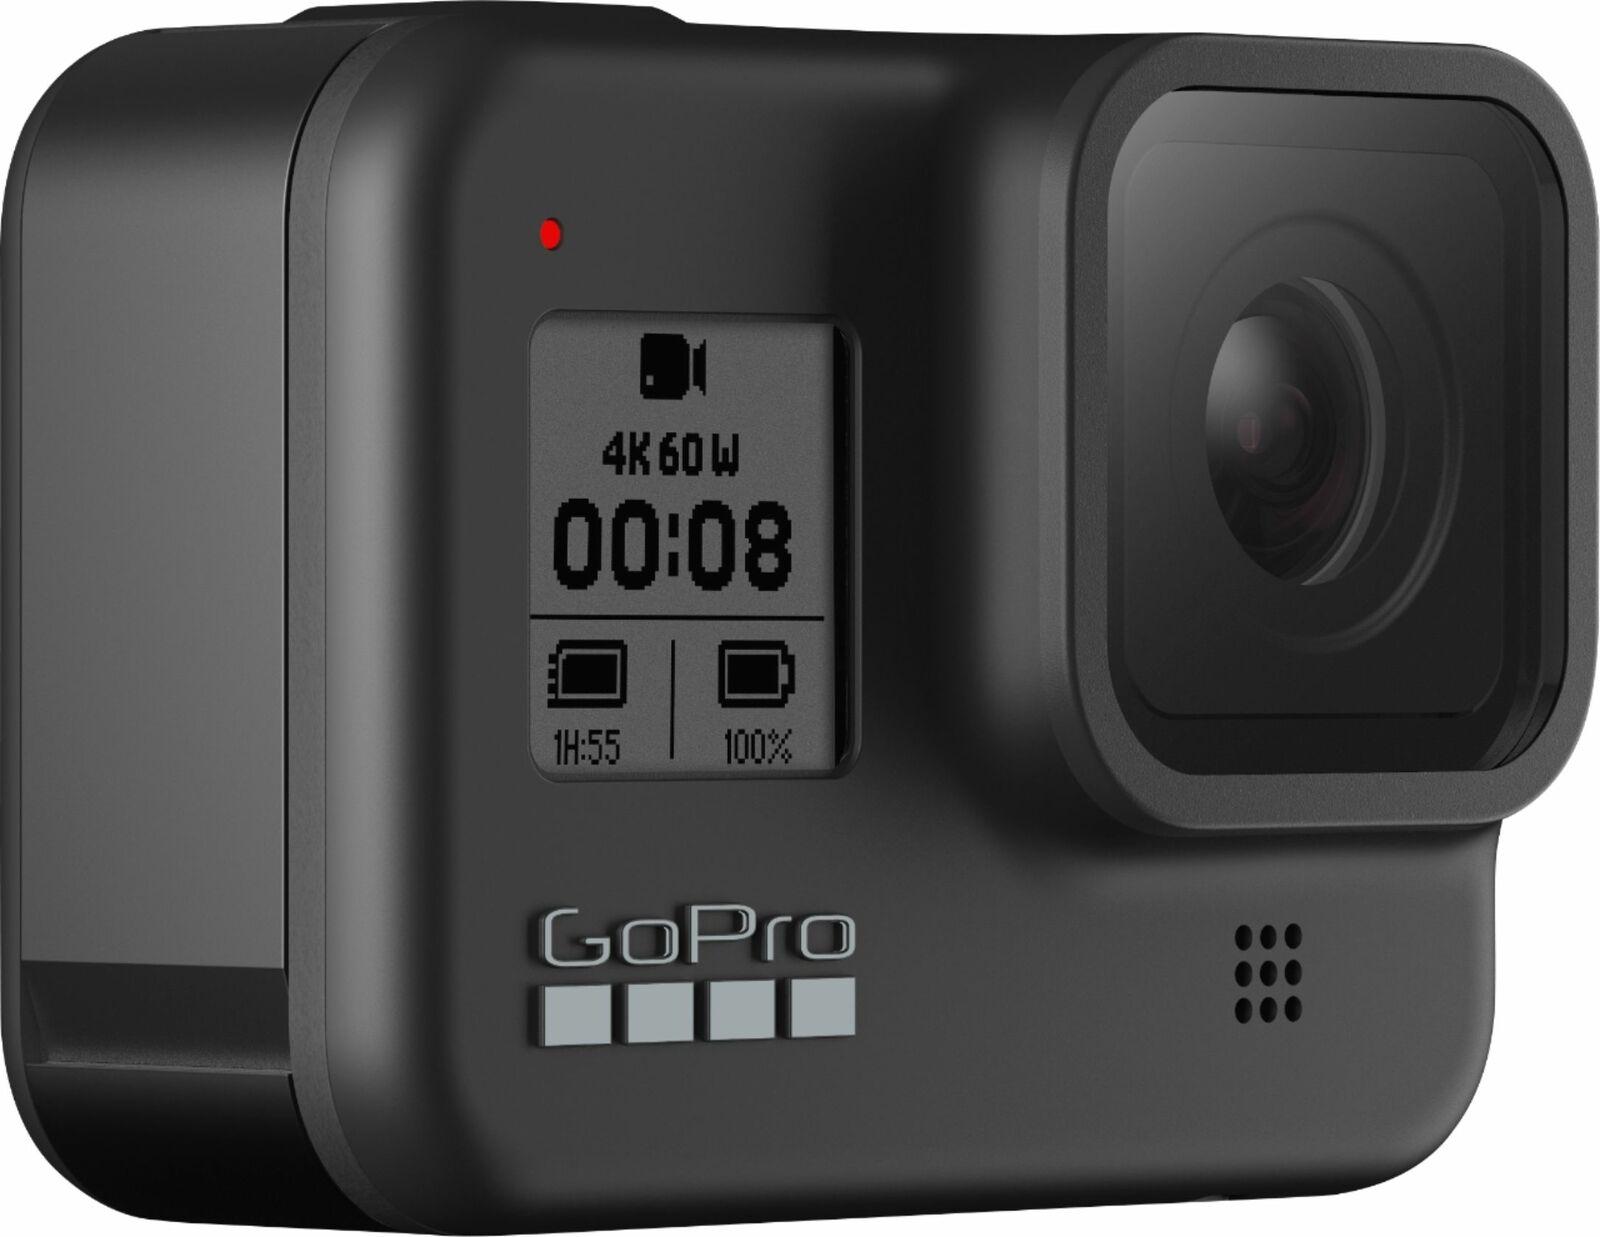 GoPro HERO8 Black - 4K Waterproof Action Camera, 12MP